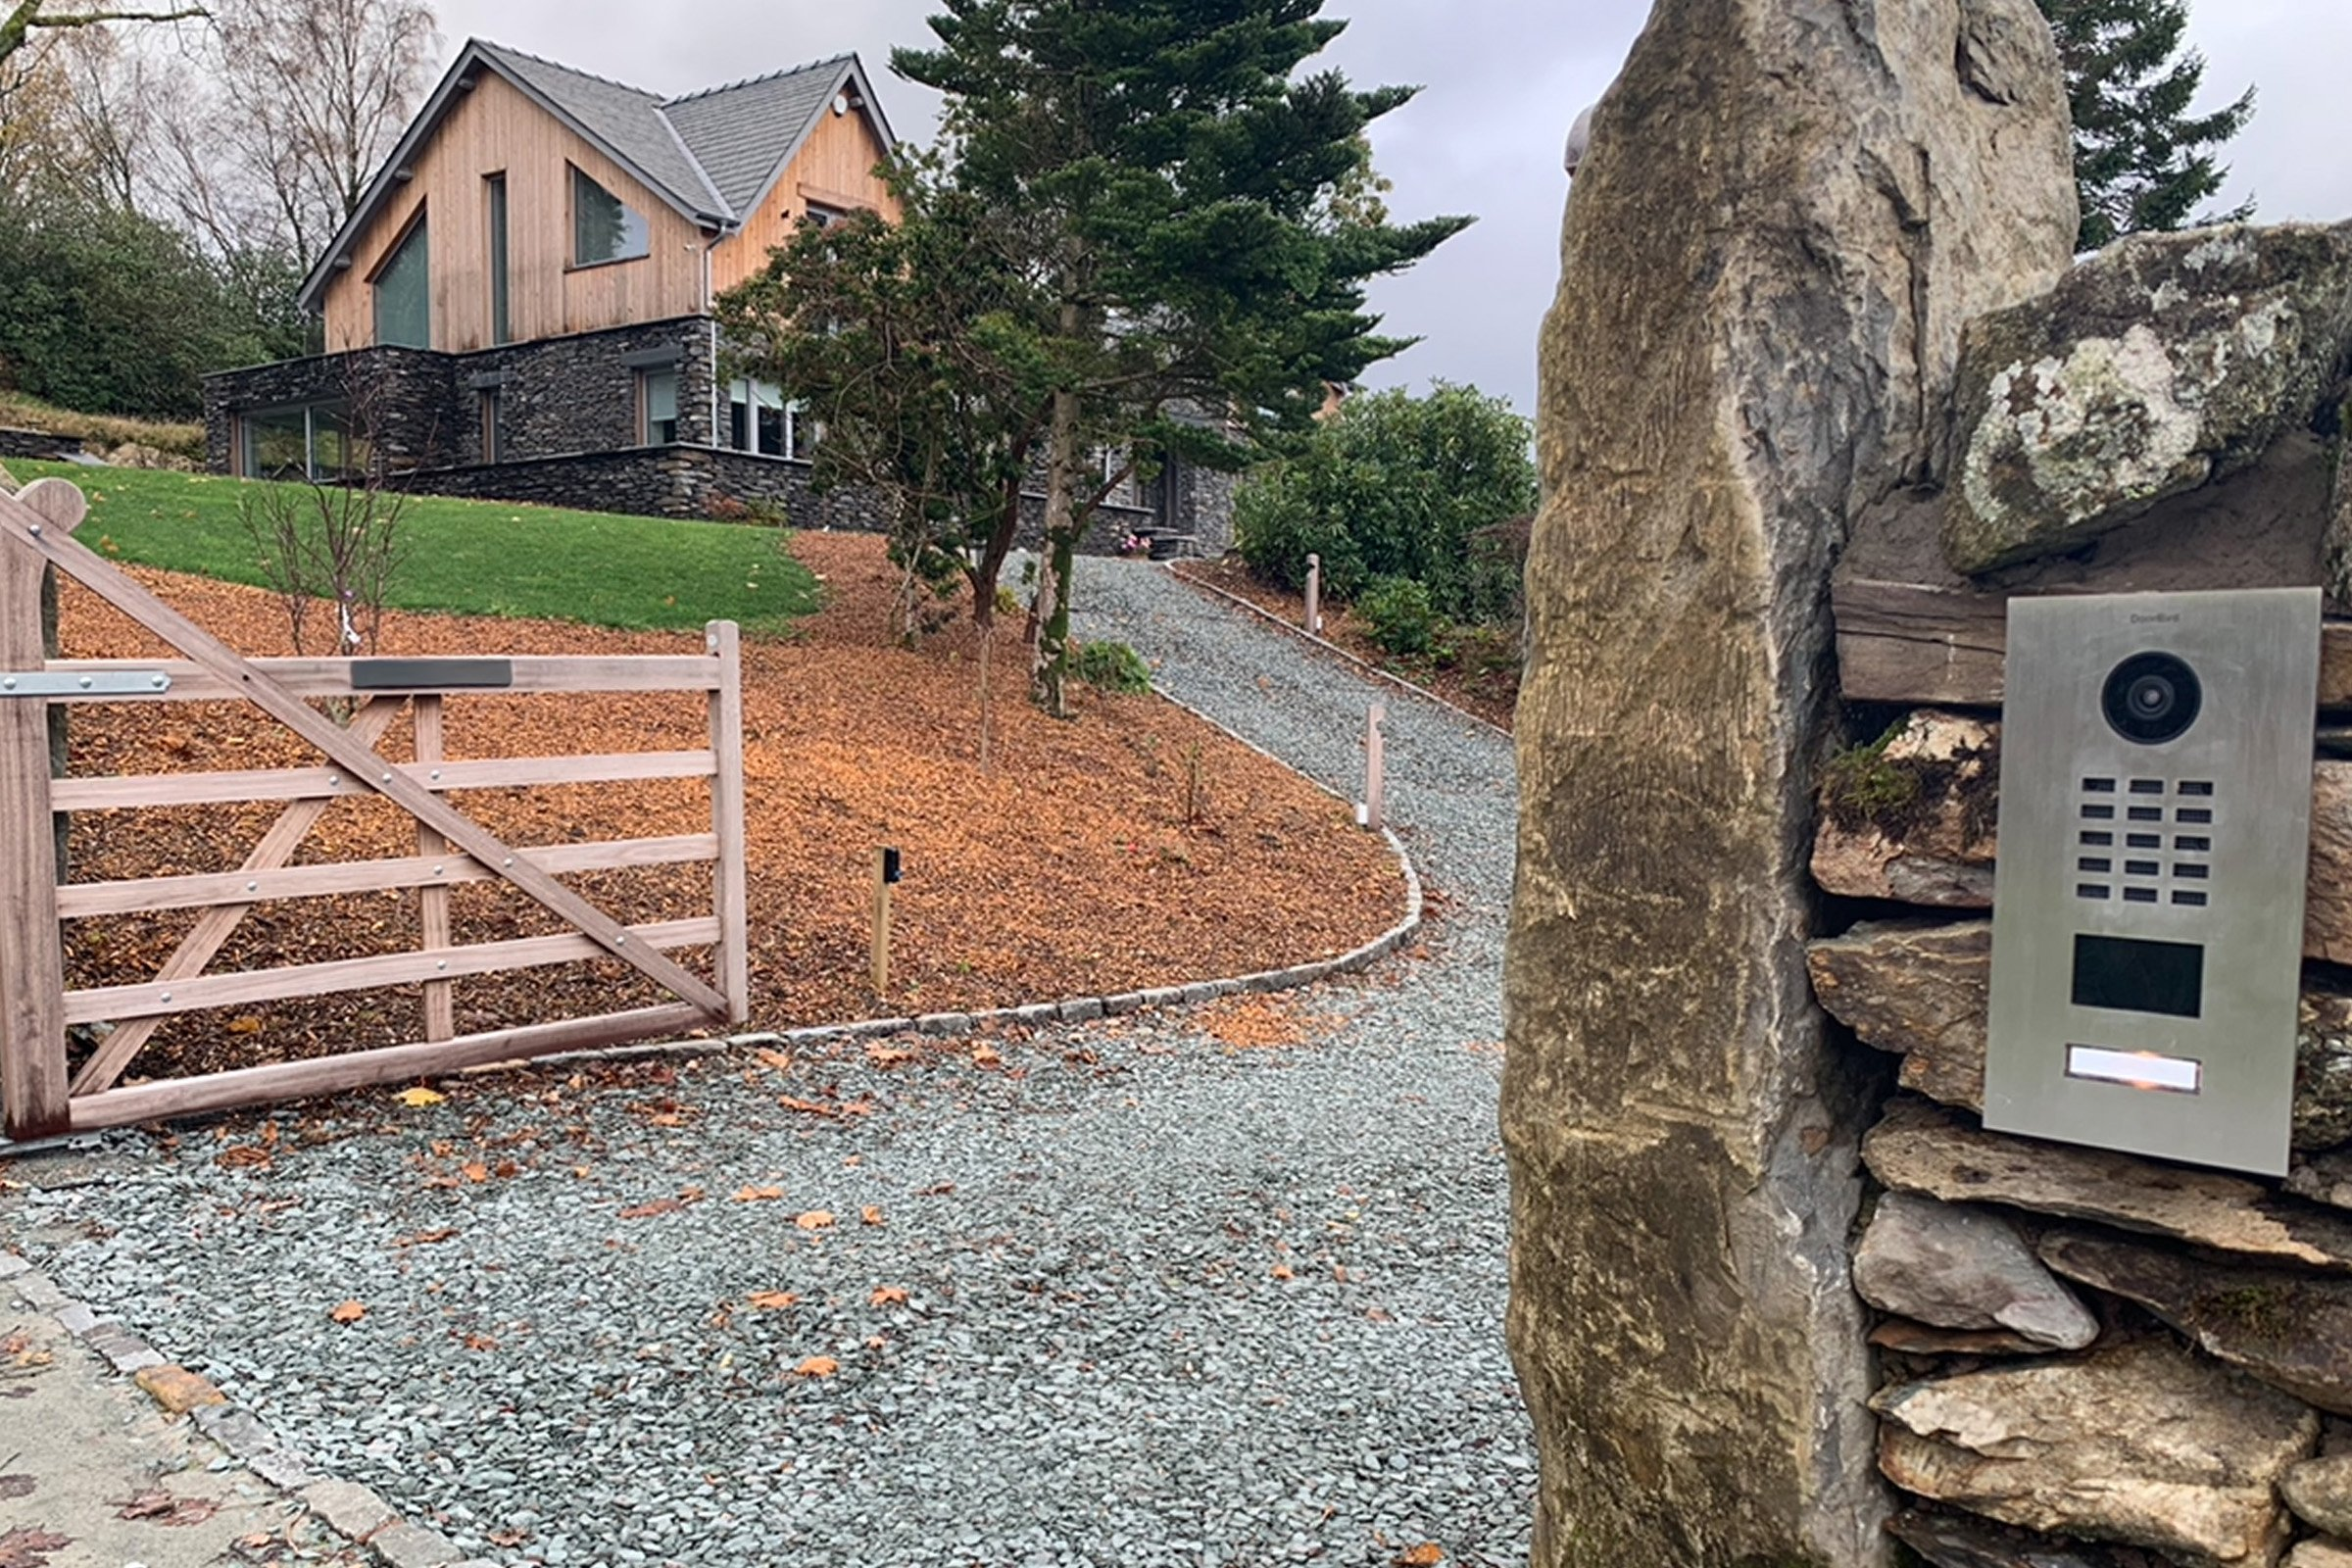 Lake District luxury home with Doorbird intercom